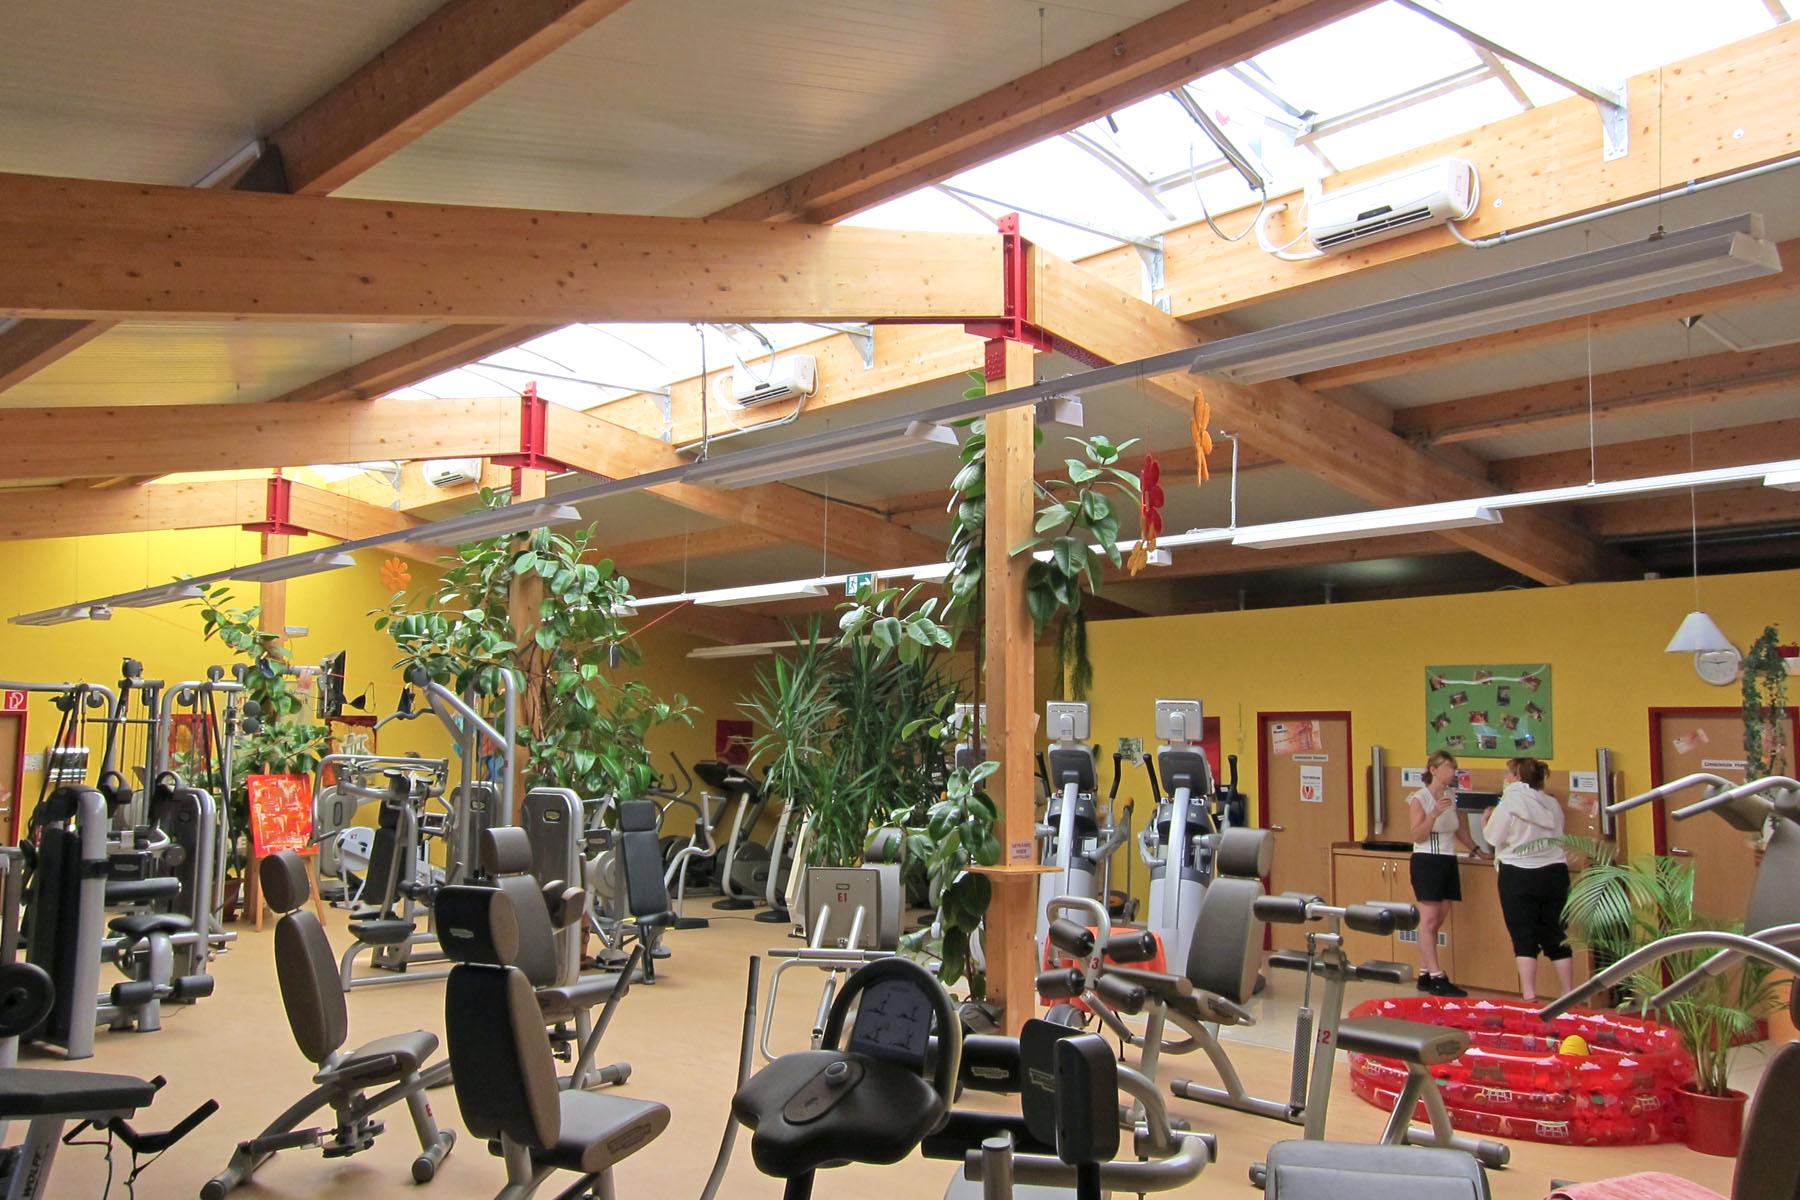 Sportgeräte in Fitnesscenter